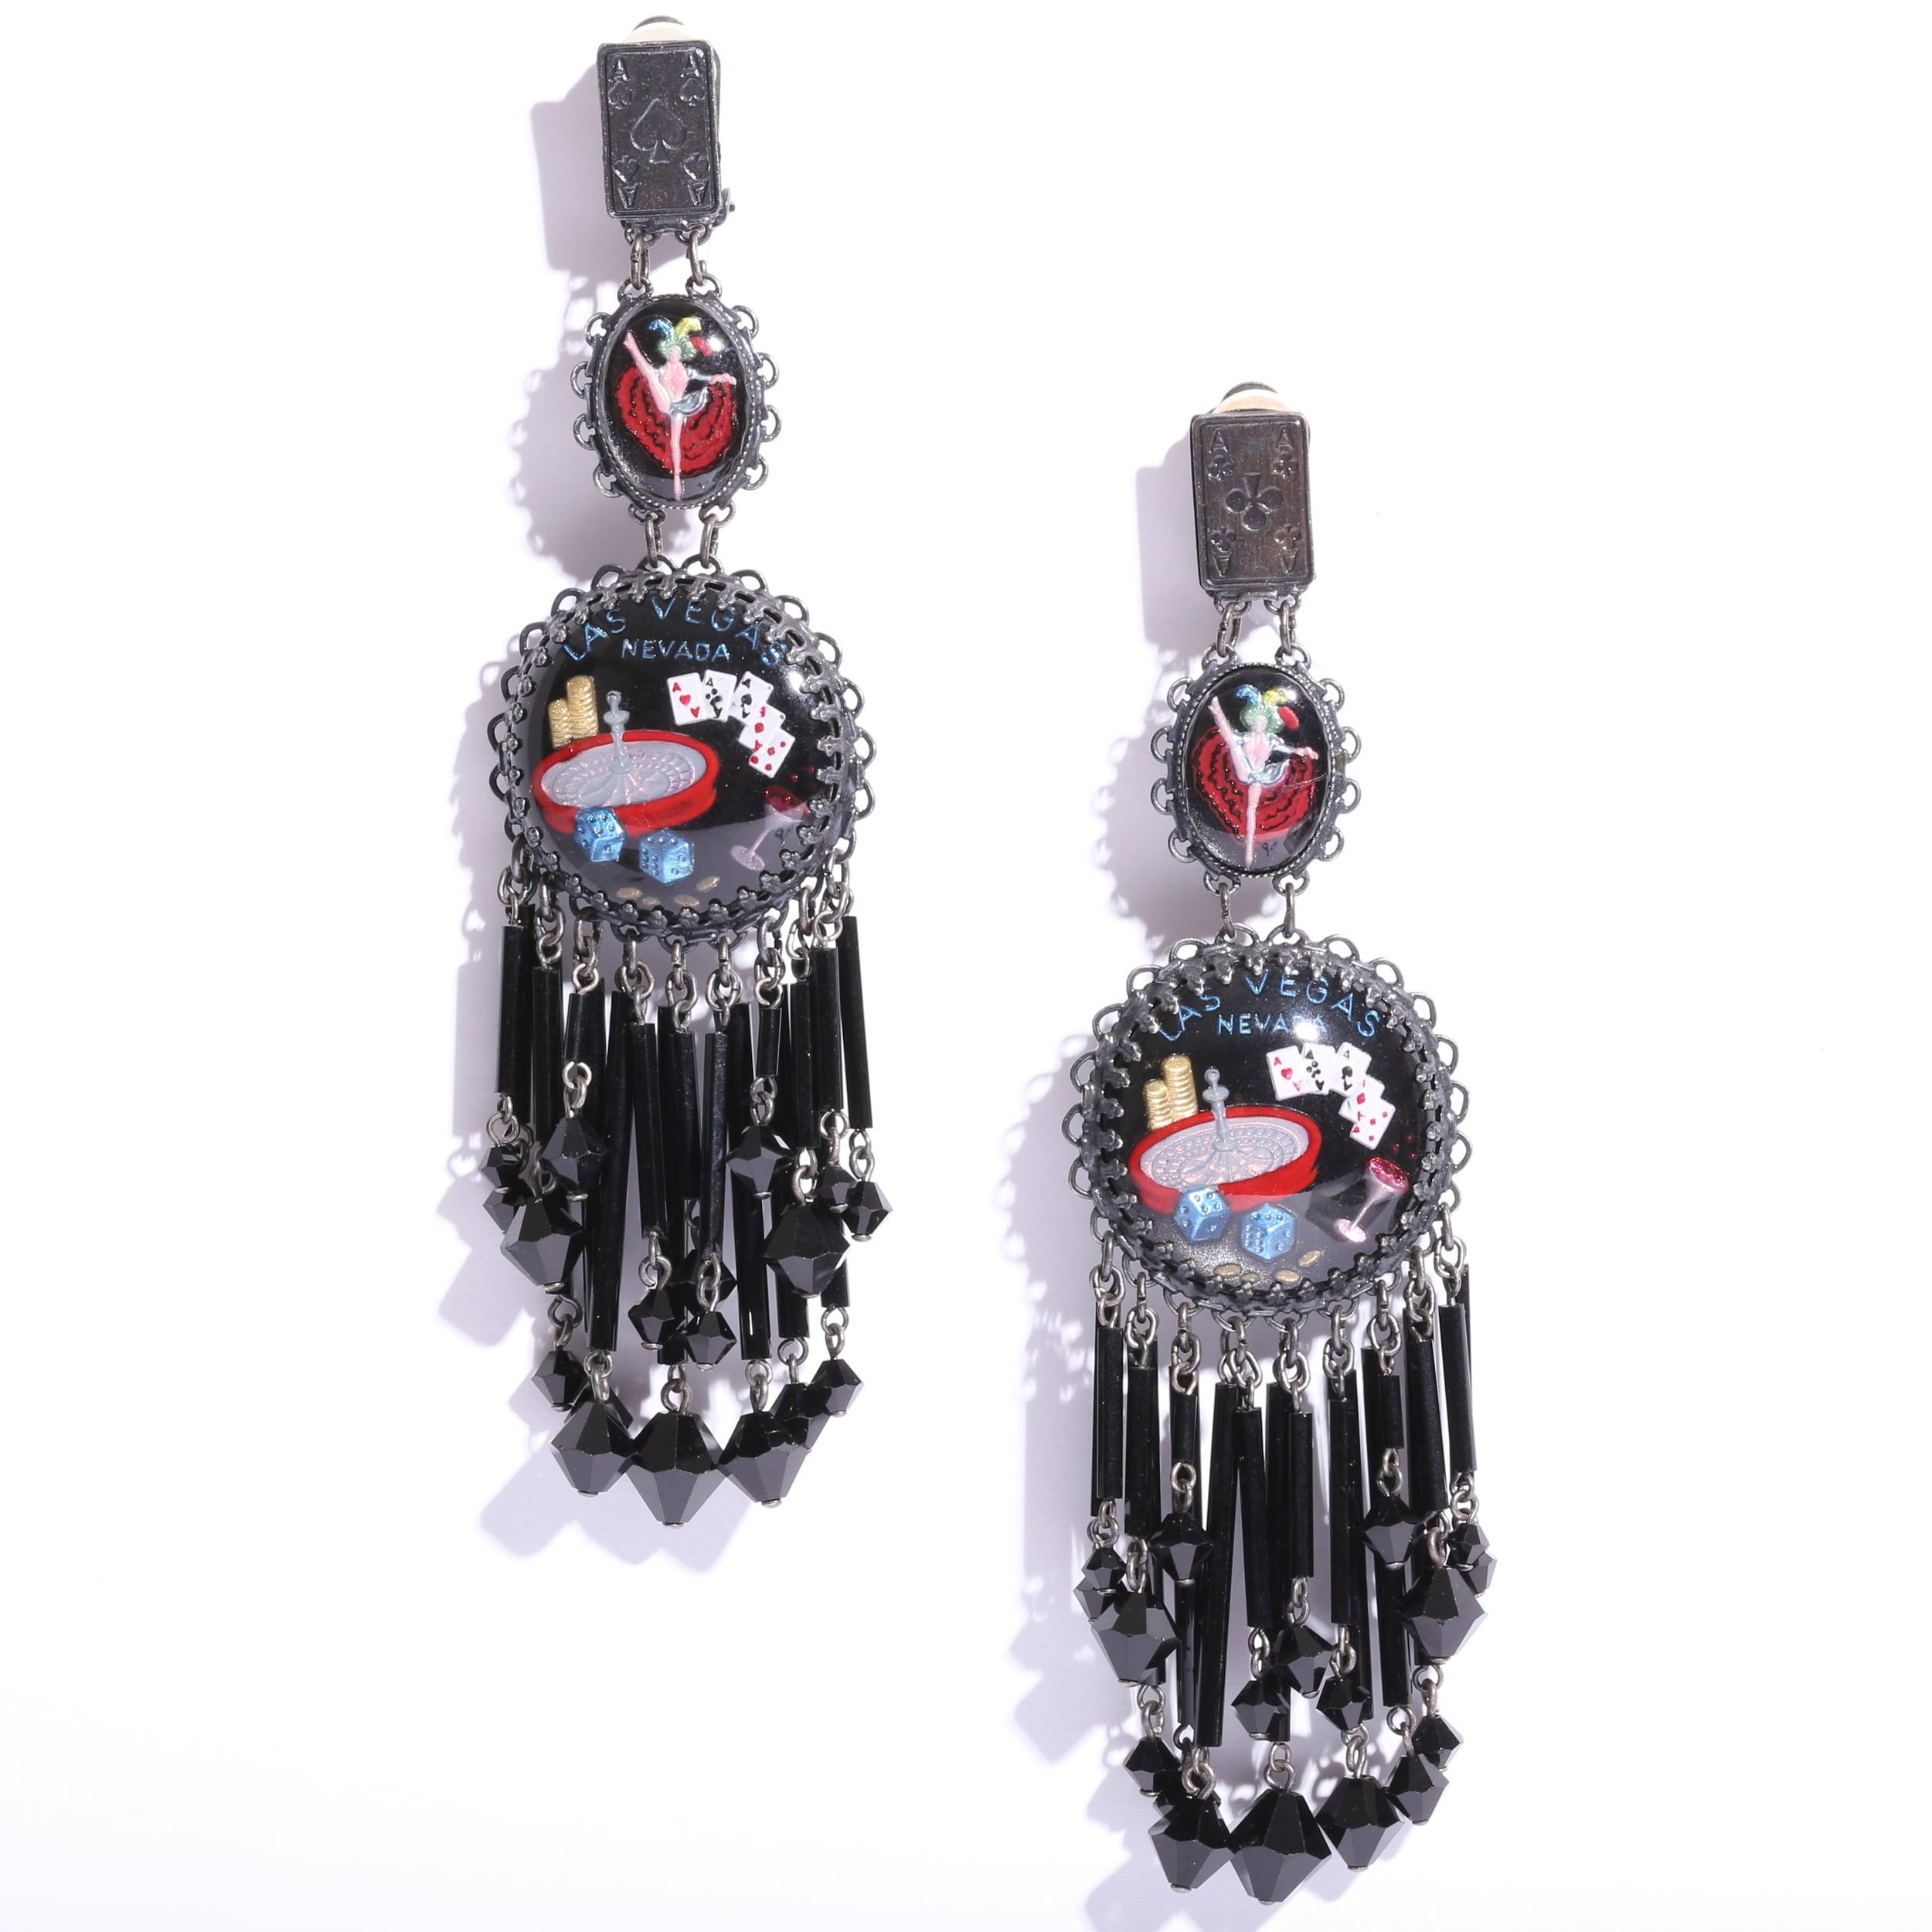 Las Vegas Cabaret earring 125イヤリング